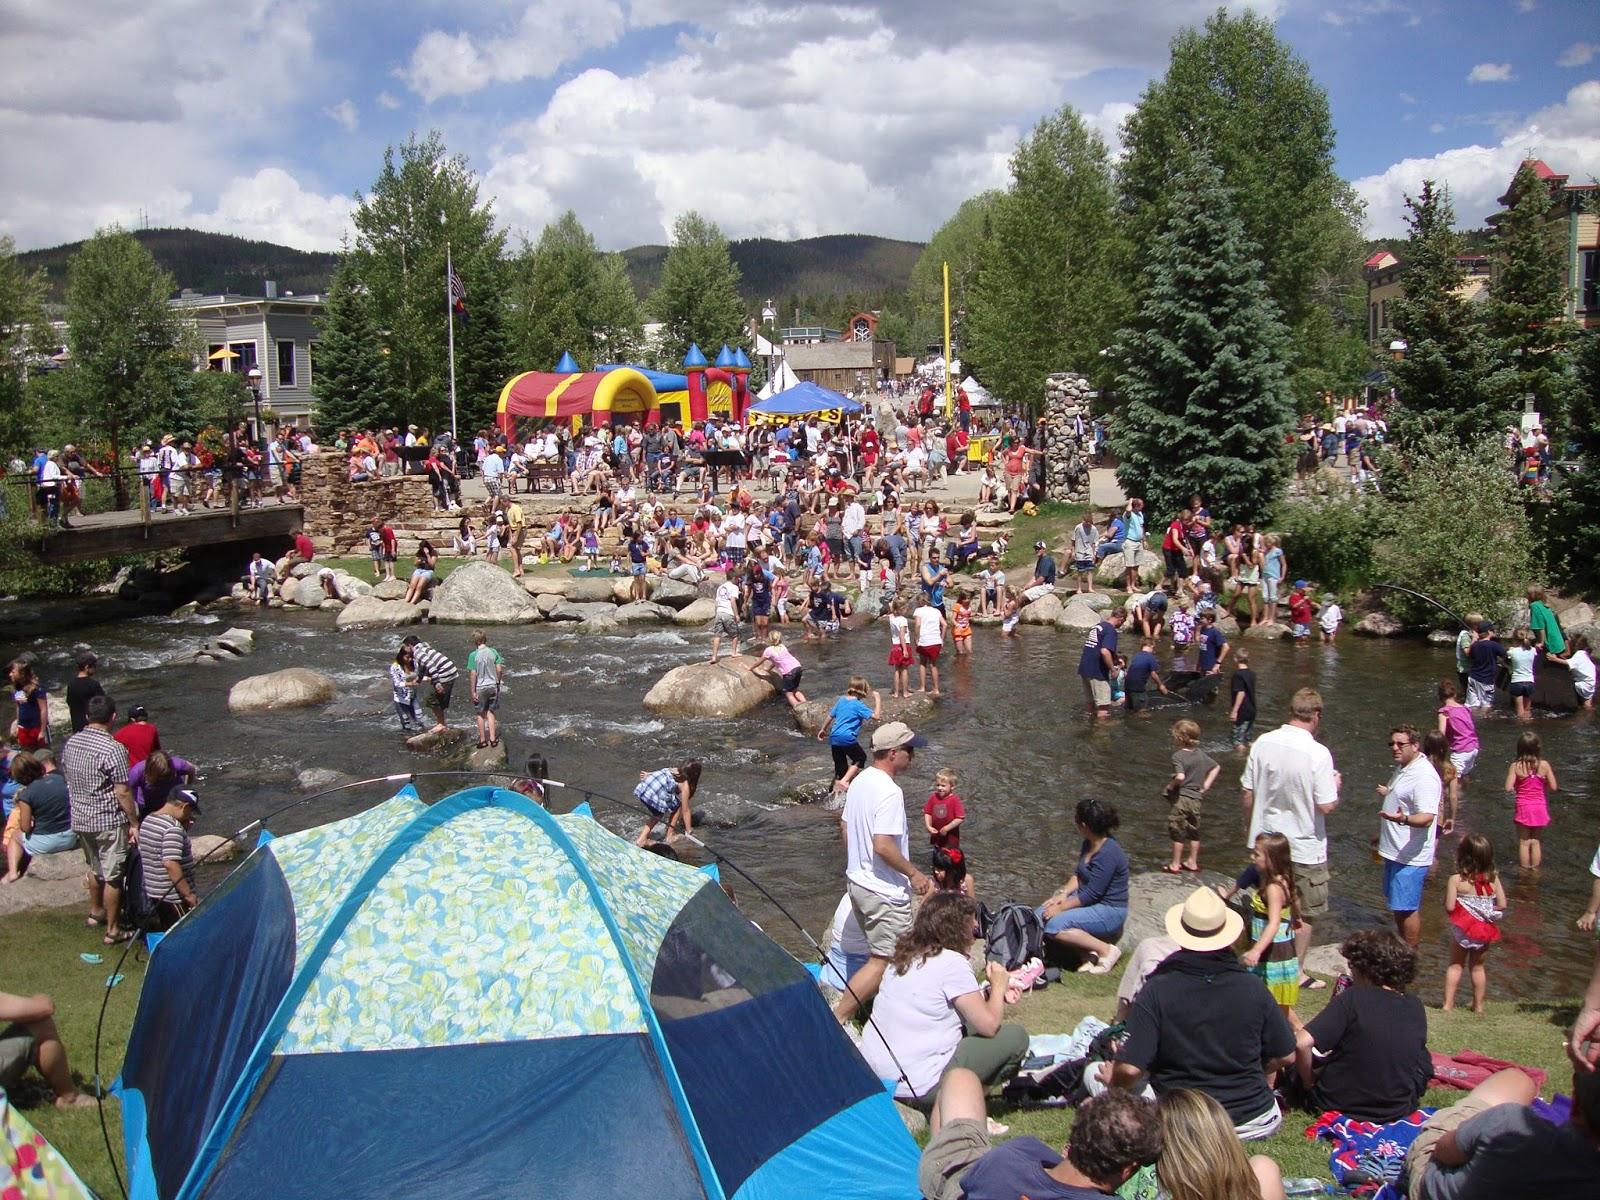 riverwalk center in breckenridge on the fourth of july